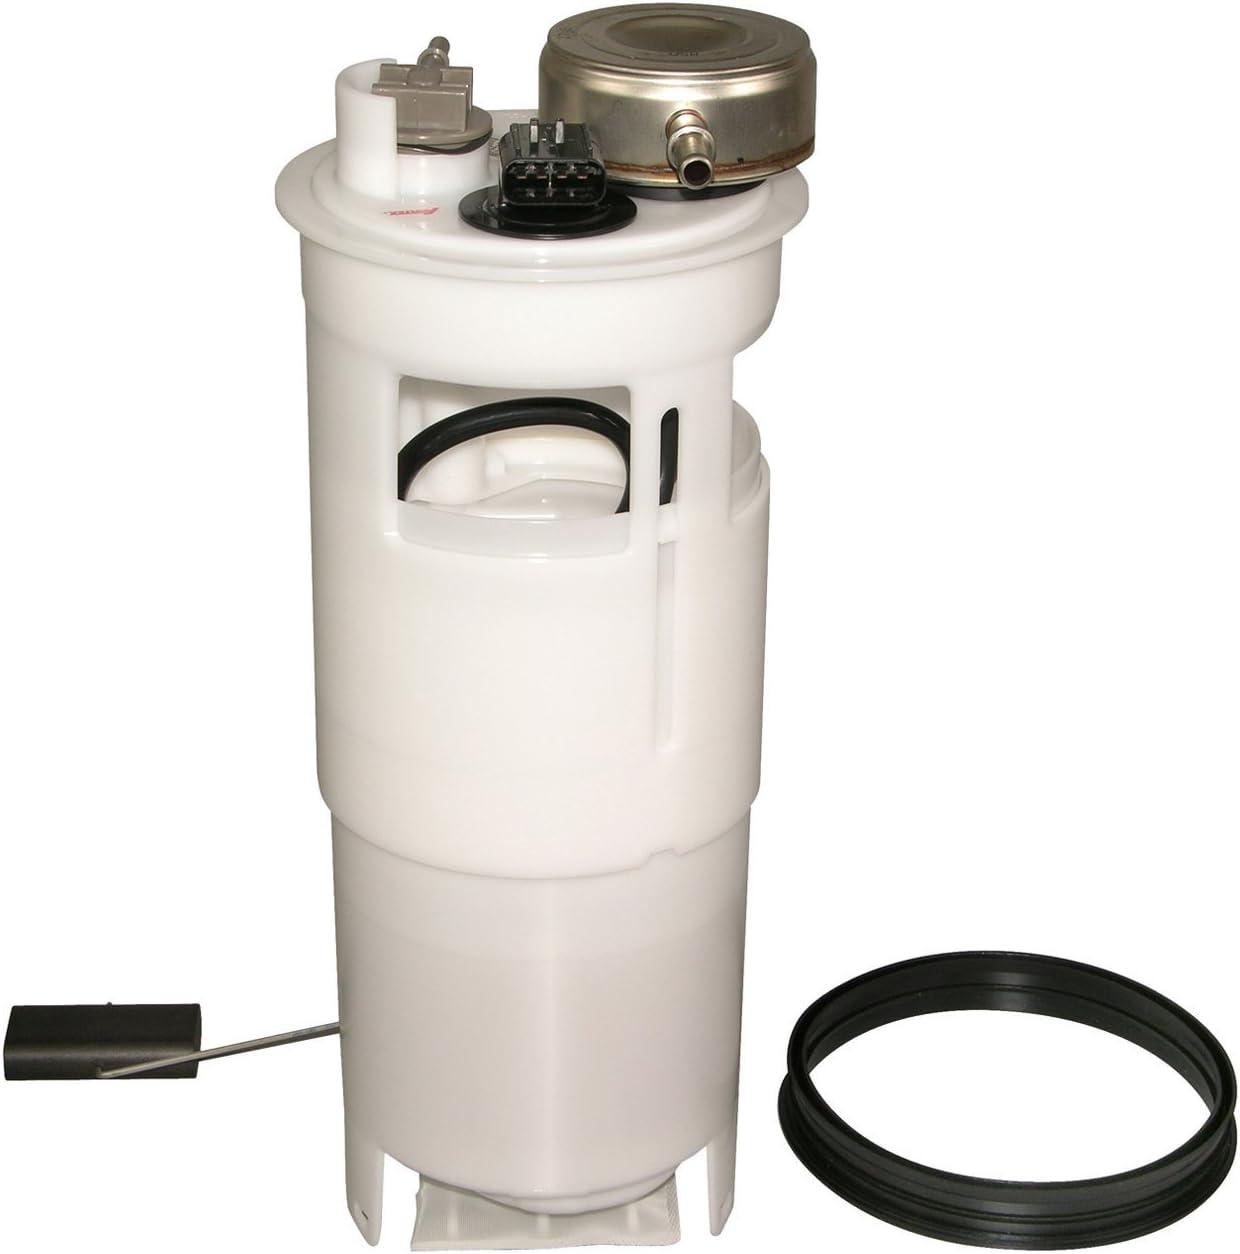 TRQ Fuel Gas Pump And Sending Unit for 98-01 Dodge Ram 1500 2500 3500 Truck